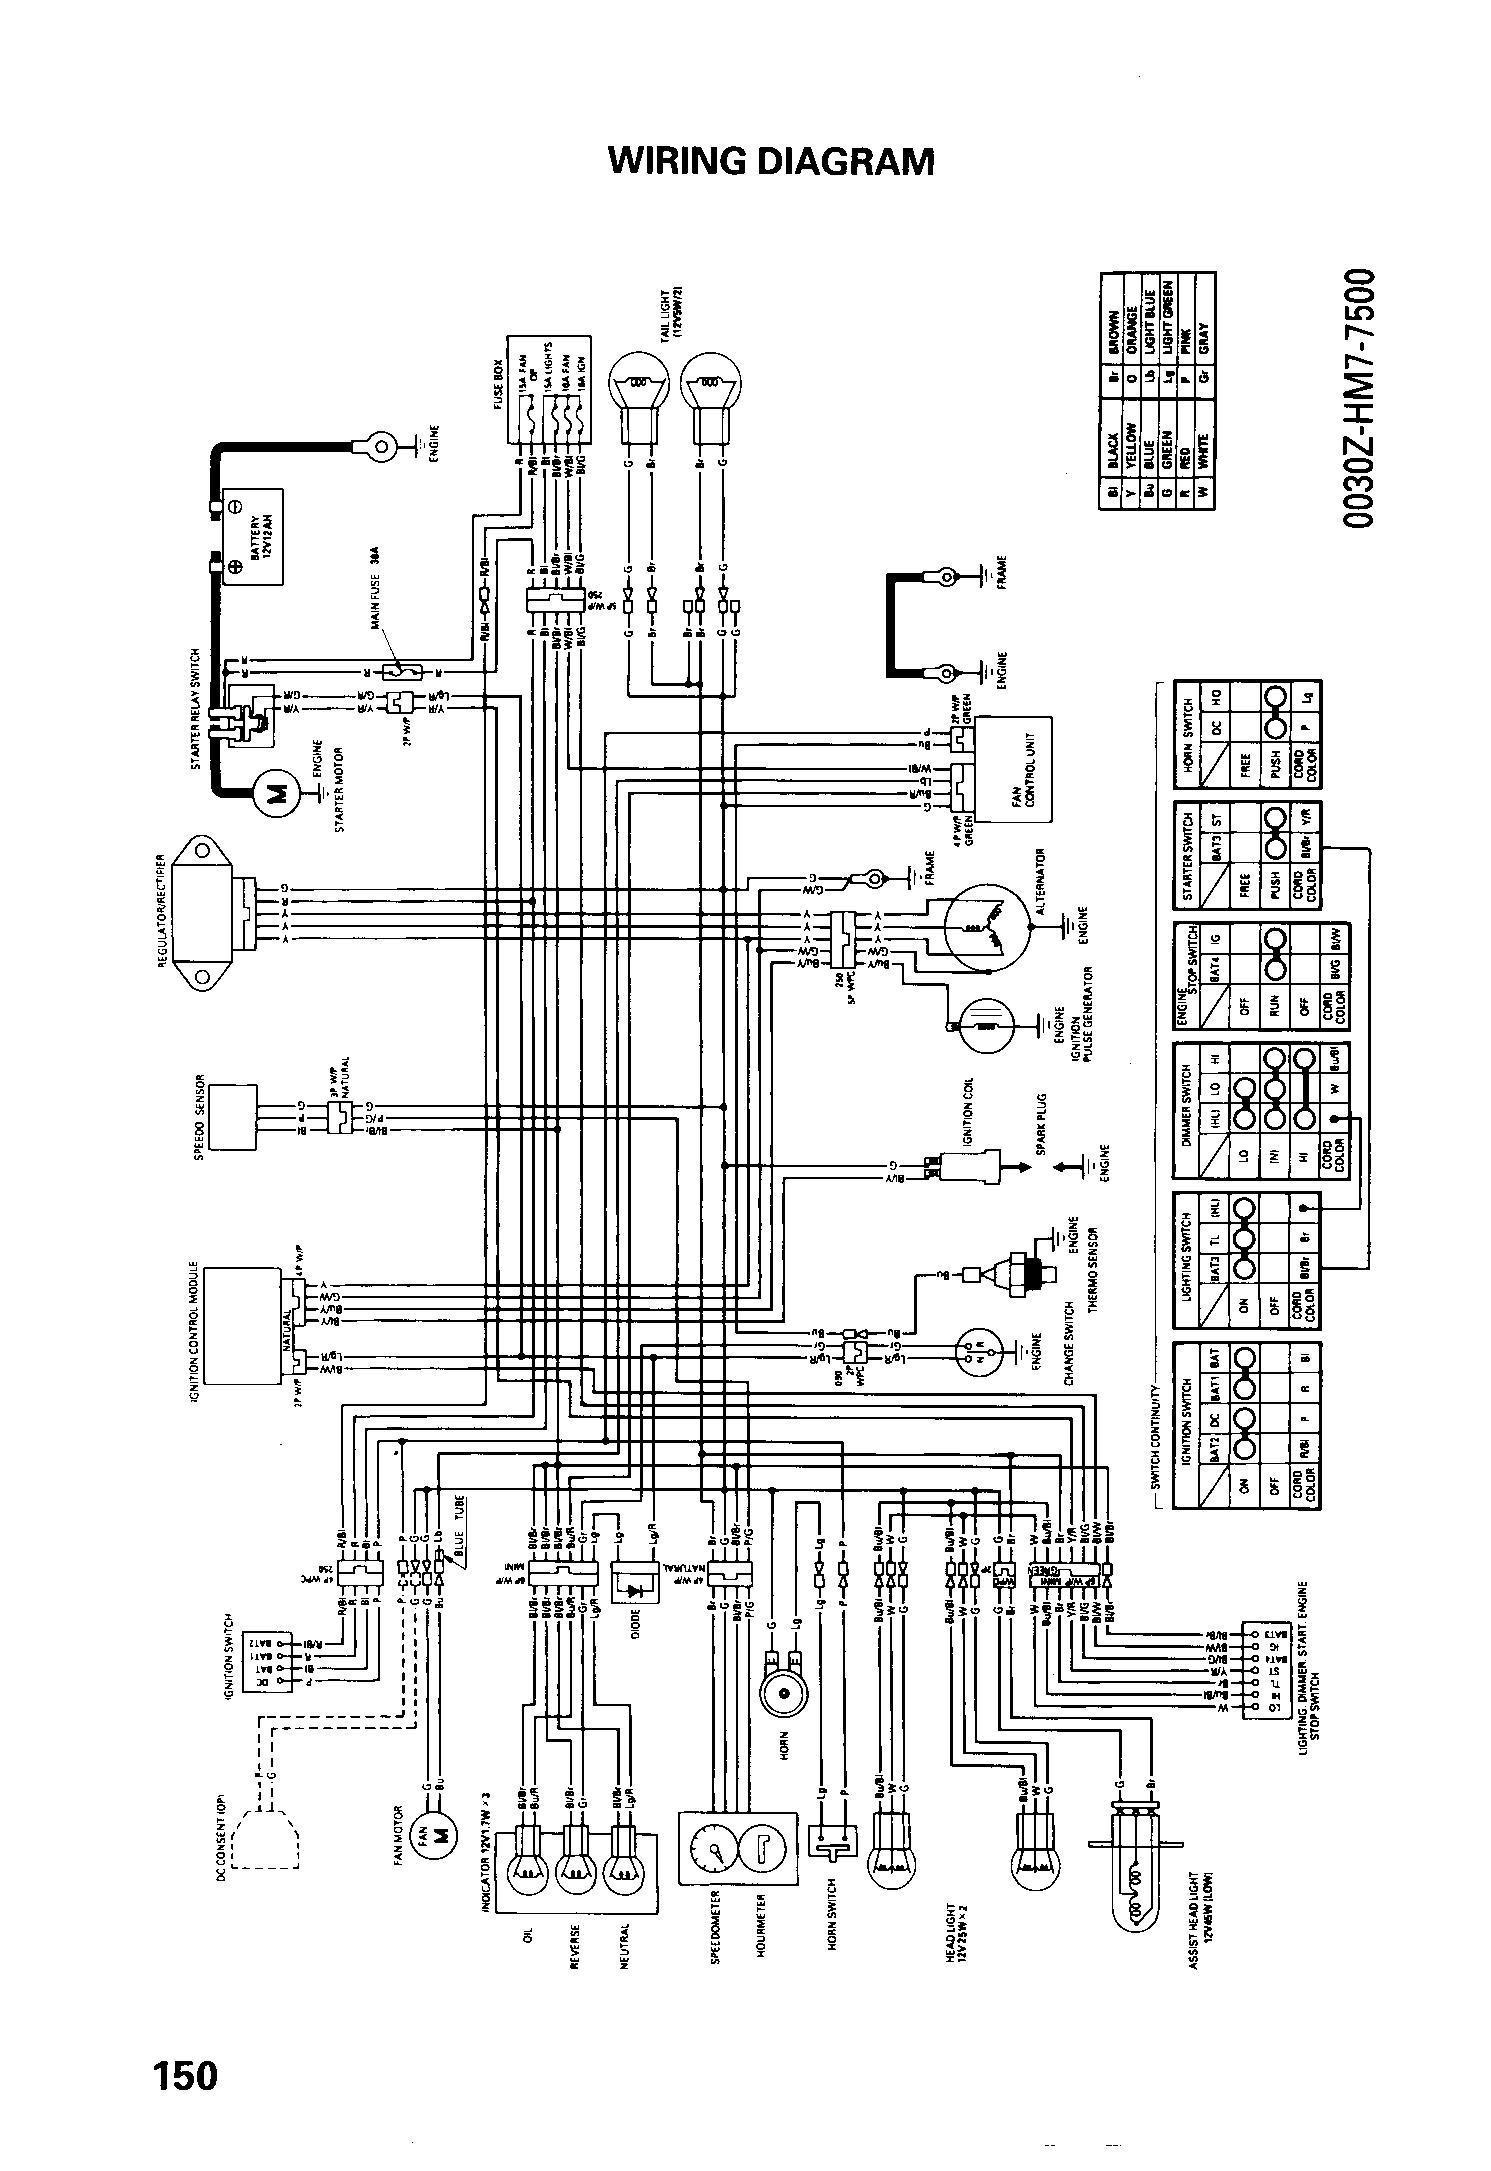 Honda Trx300ex Wiring Diagram